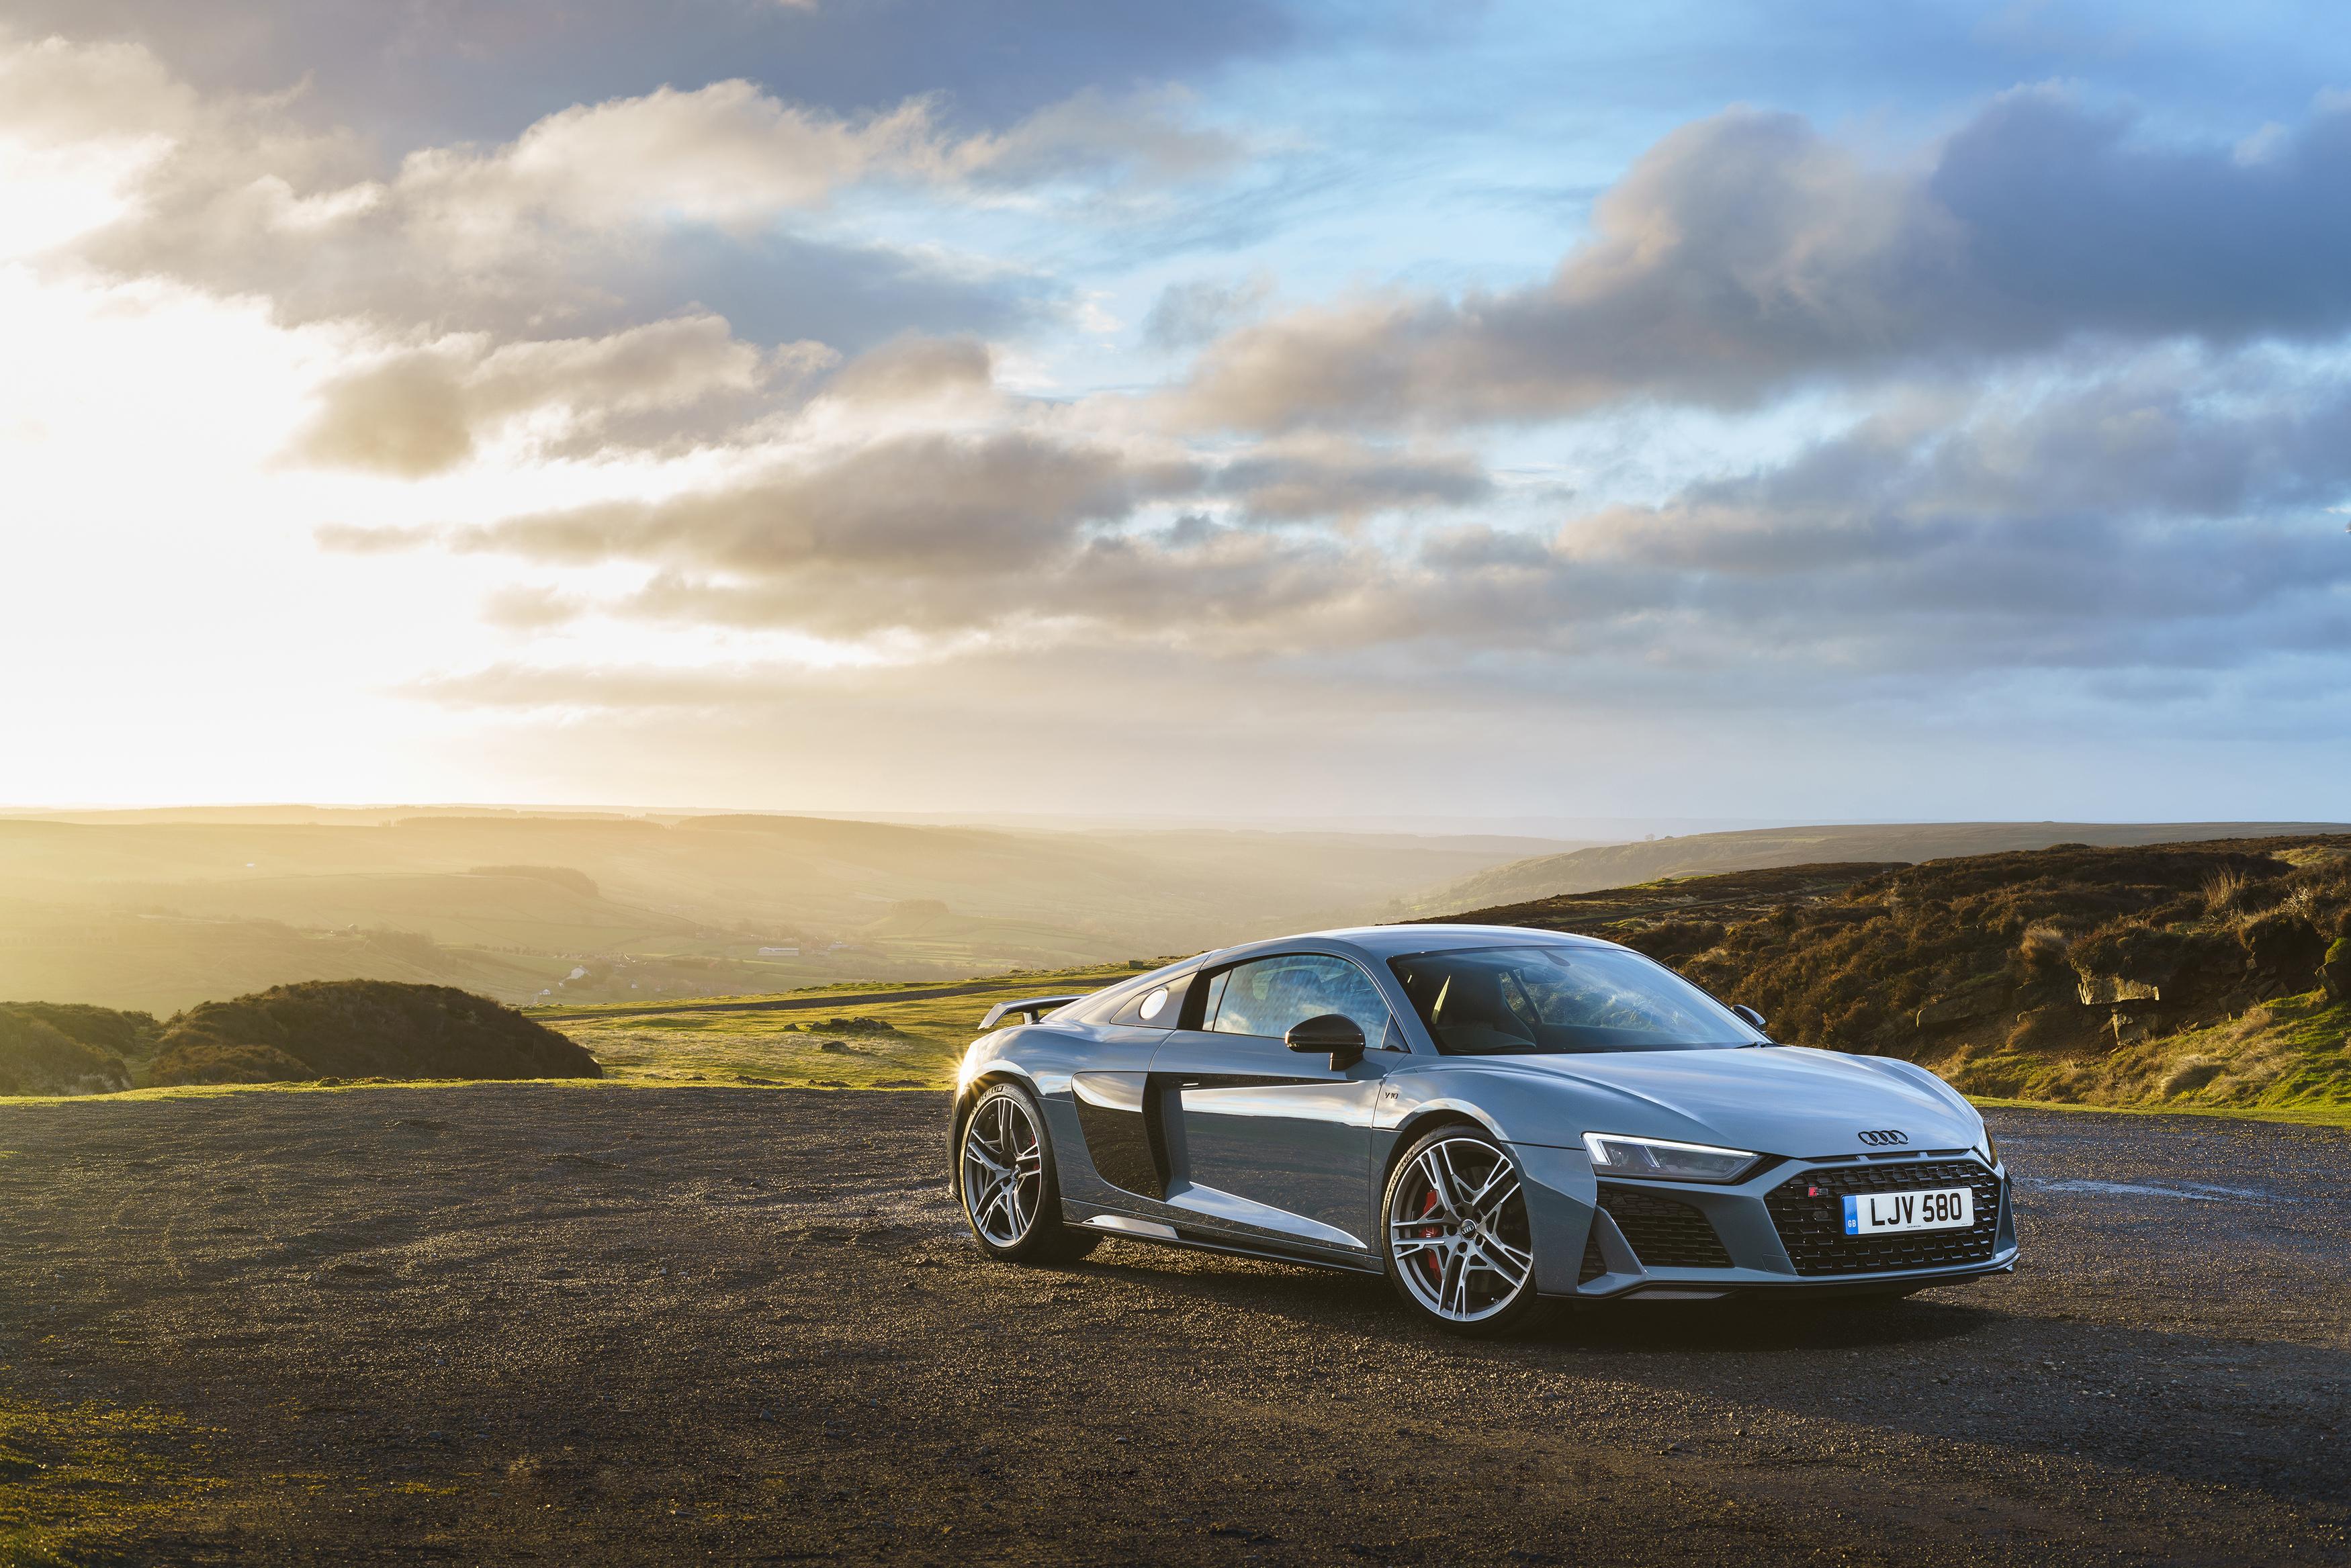 Audi R8 V10 Performance 2019 4k, HD Cars, 4k Wallpapers ...